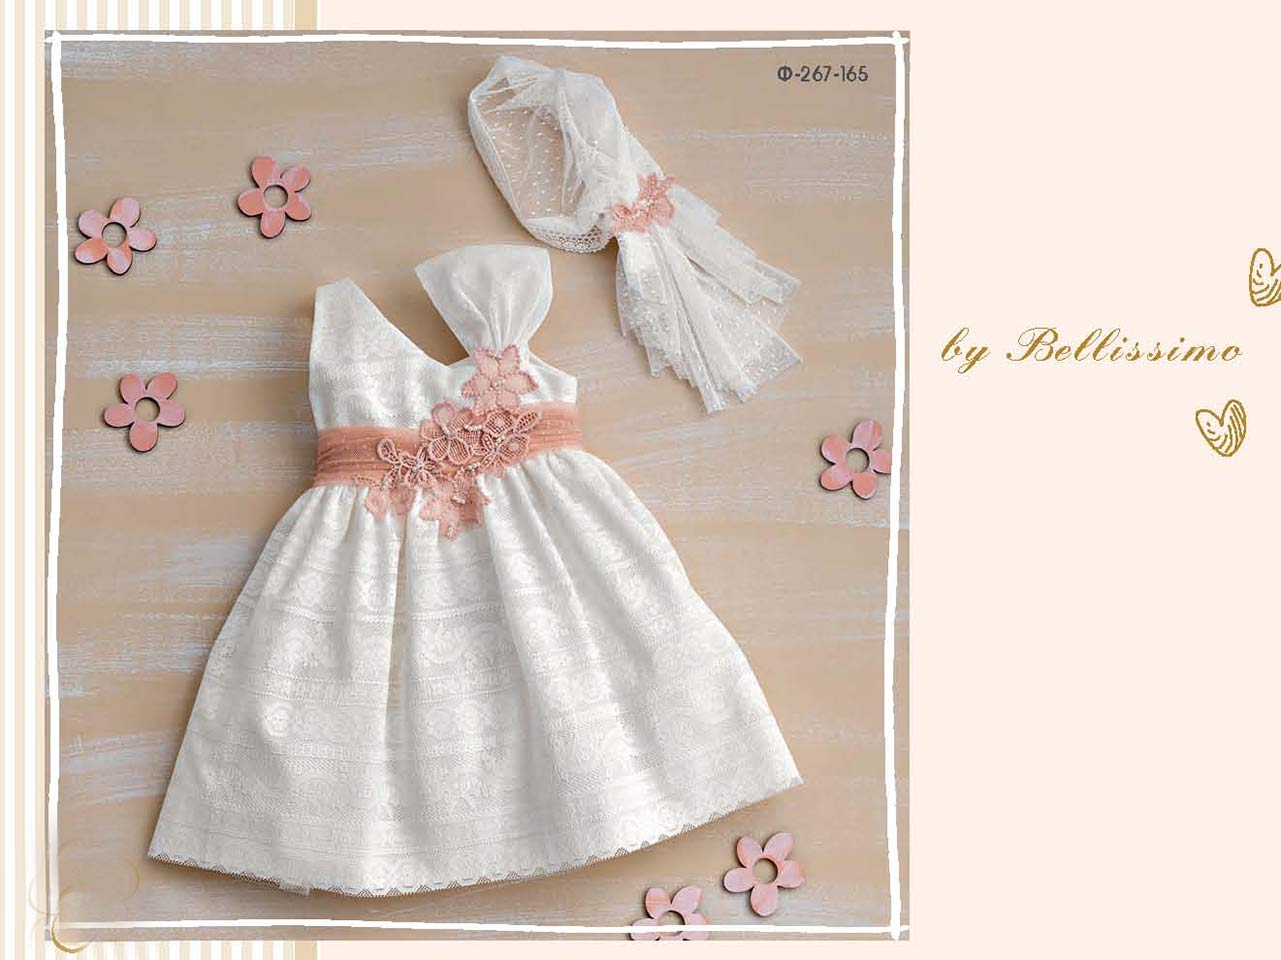 0c91e043f84b ... Βαπτιστικά Ρούχα   Βαπτιστικό Φόρεμα Δαντέλα. 🔍.  vaptistiko-forema-f264-168